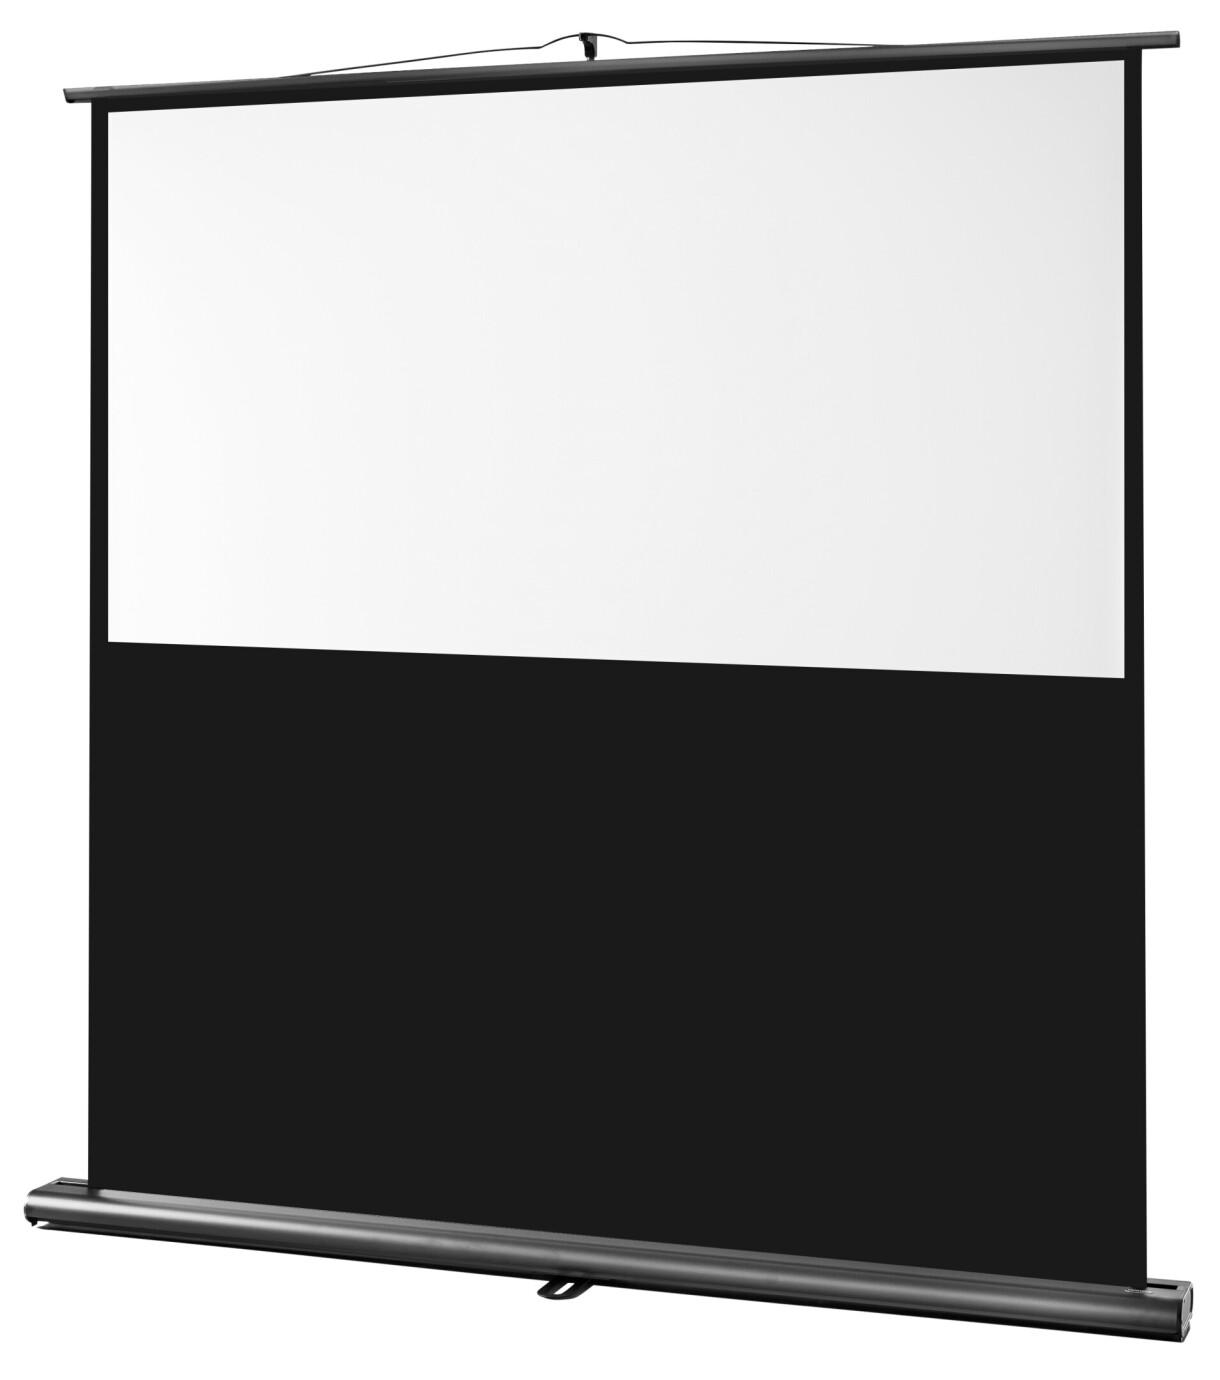 Celexon Ultramobile Professional - 120cm x 75cm - 16:10 Portable Projector Screen - 1091788 - 16:10